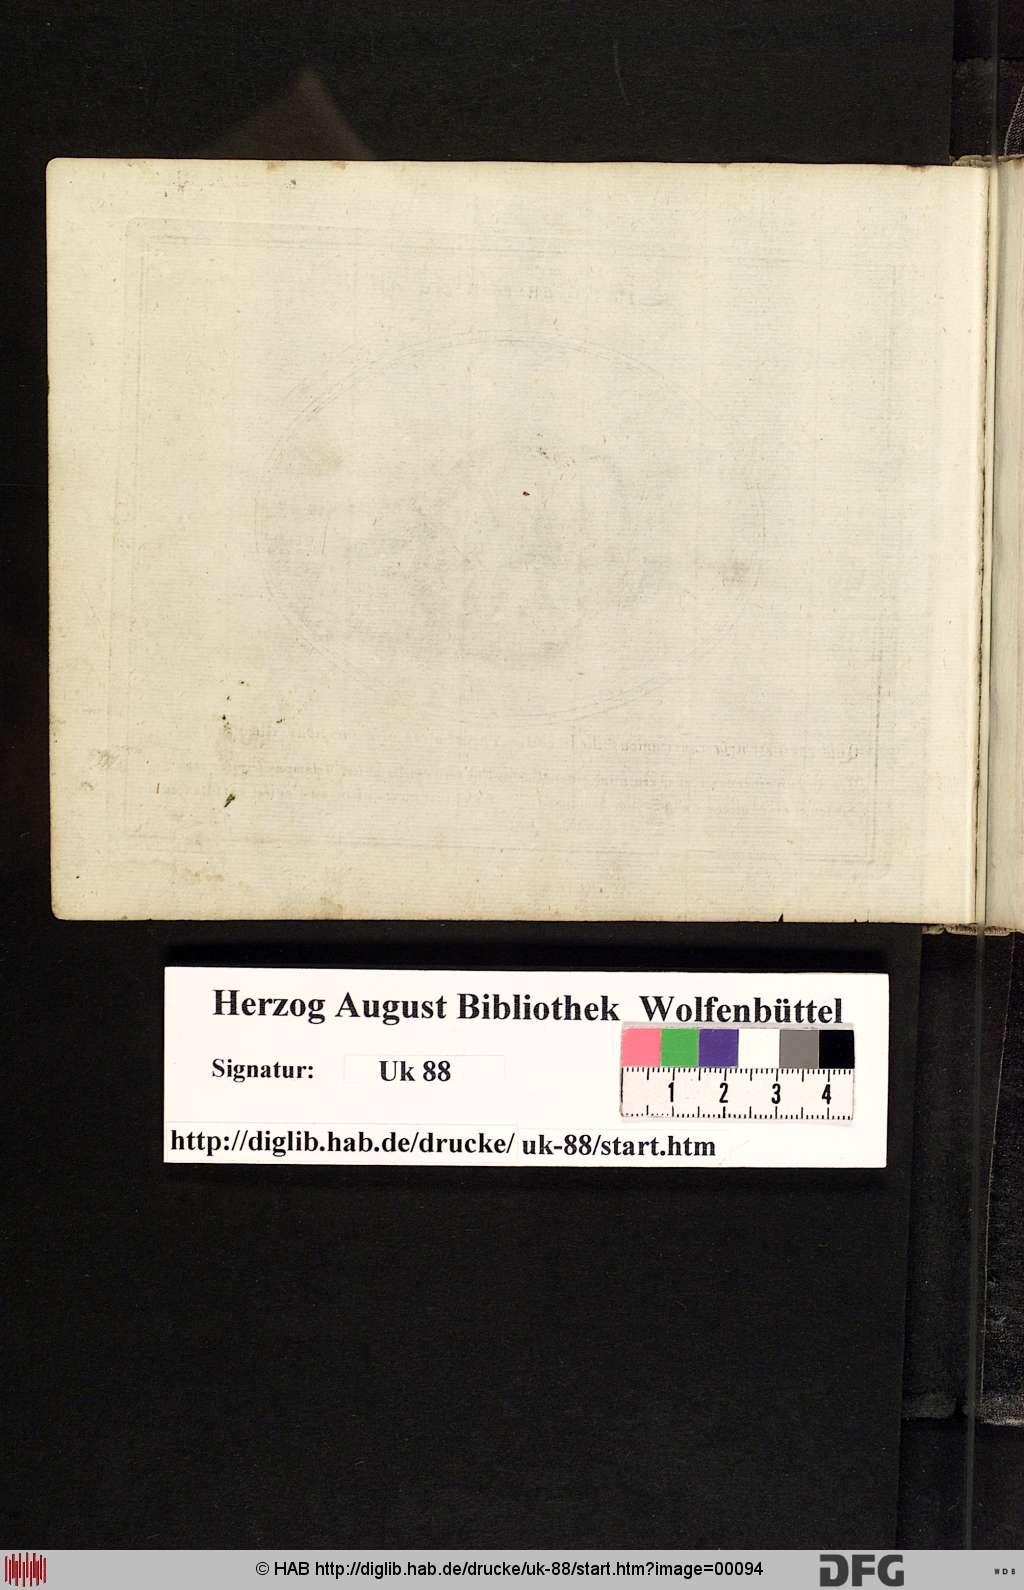 http://diglib.hab.de/drucke/uk-88/00094.jpg